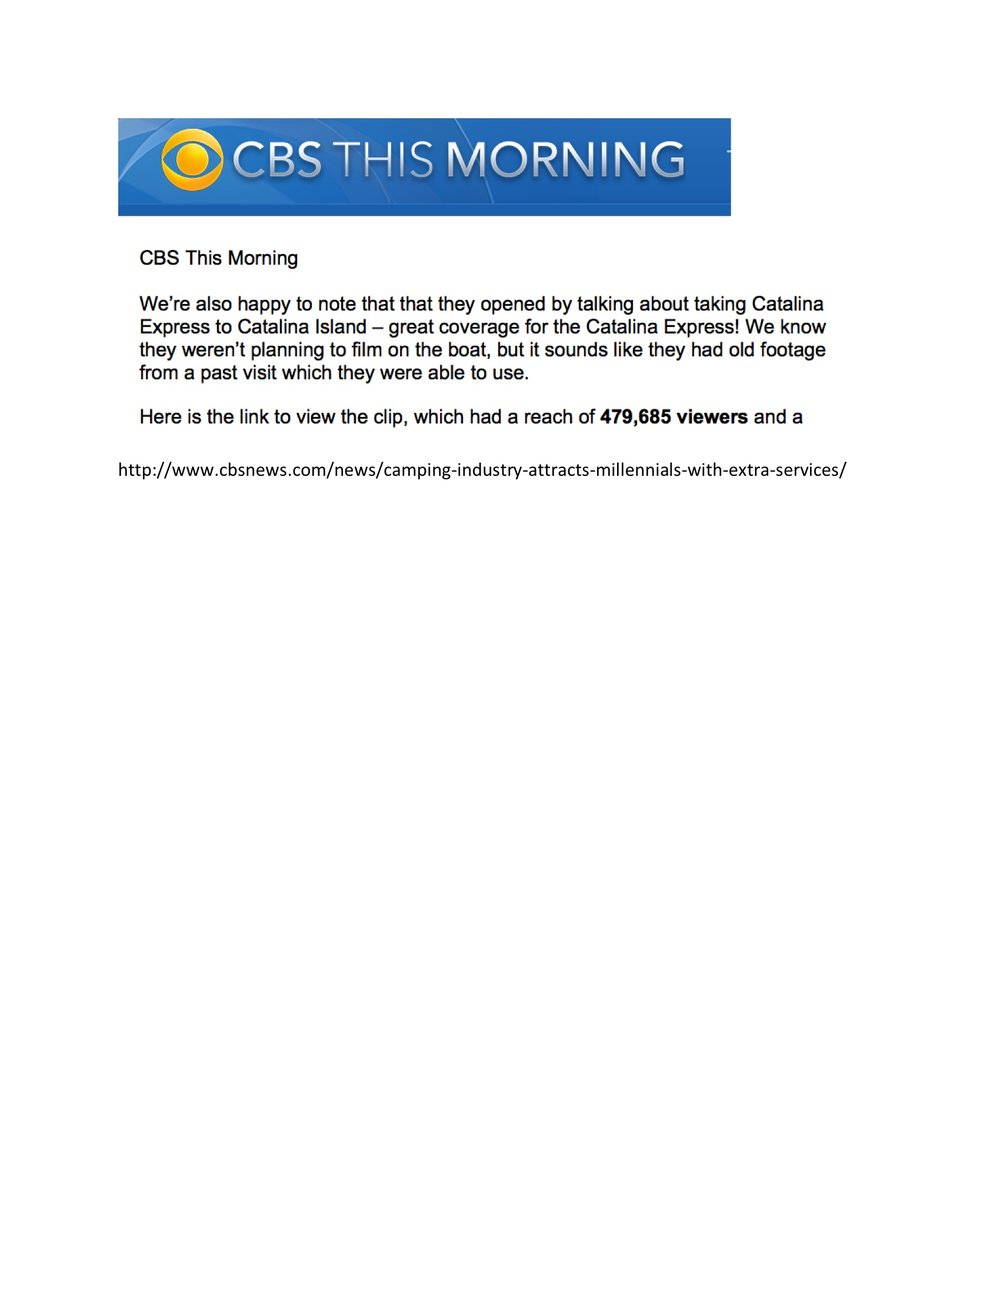 July 29 CBS This Morning-1.jpeg